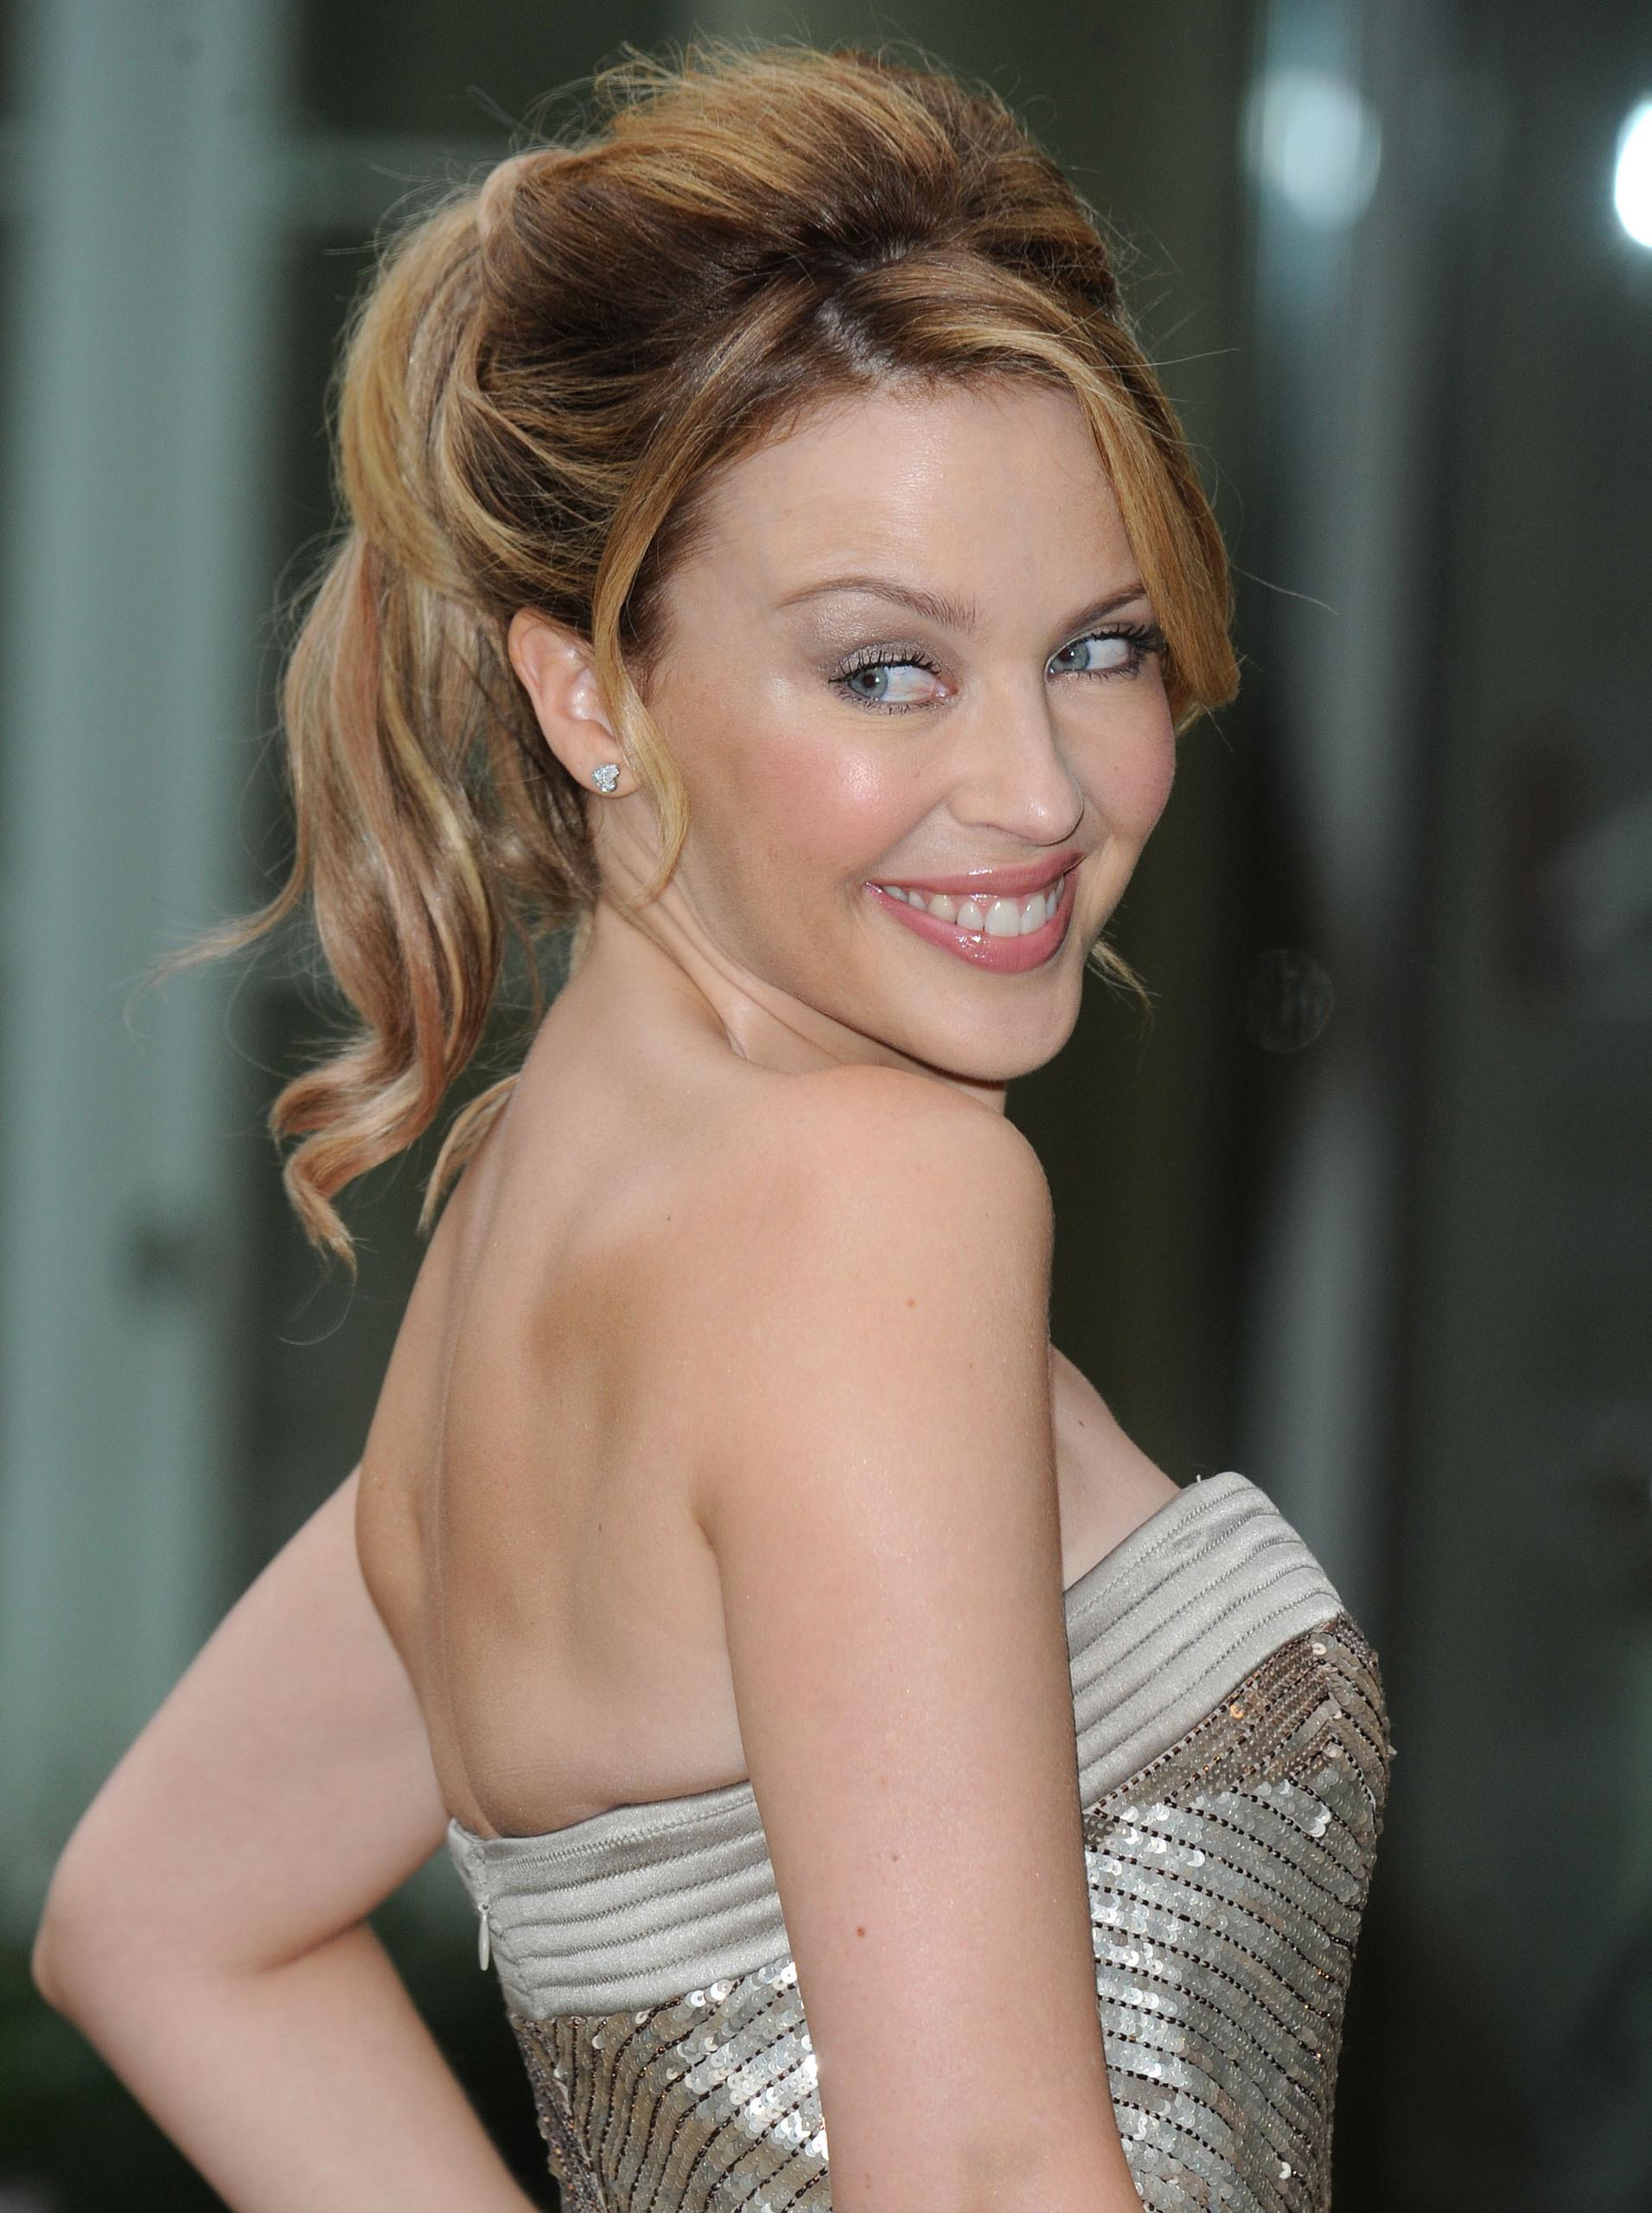 Kylie Anne